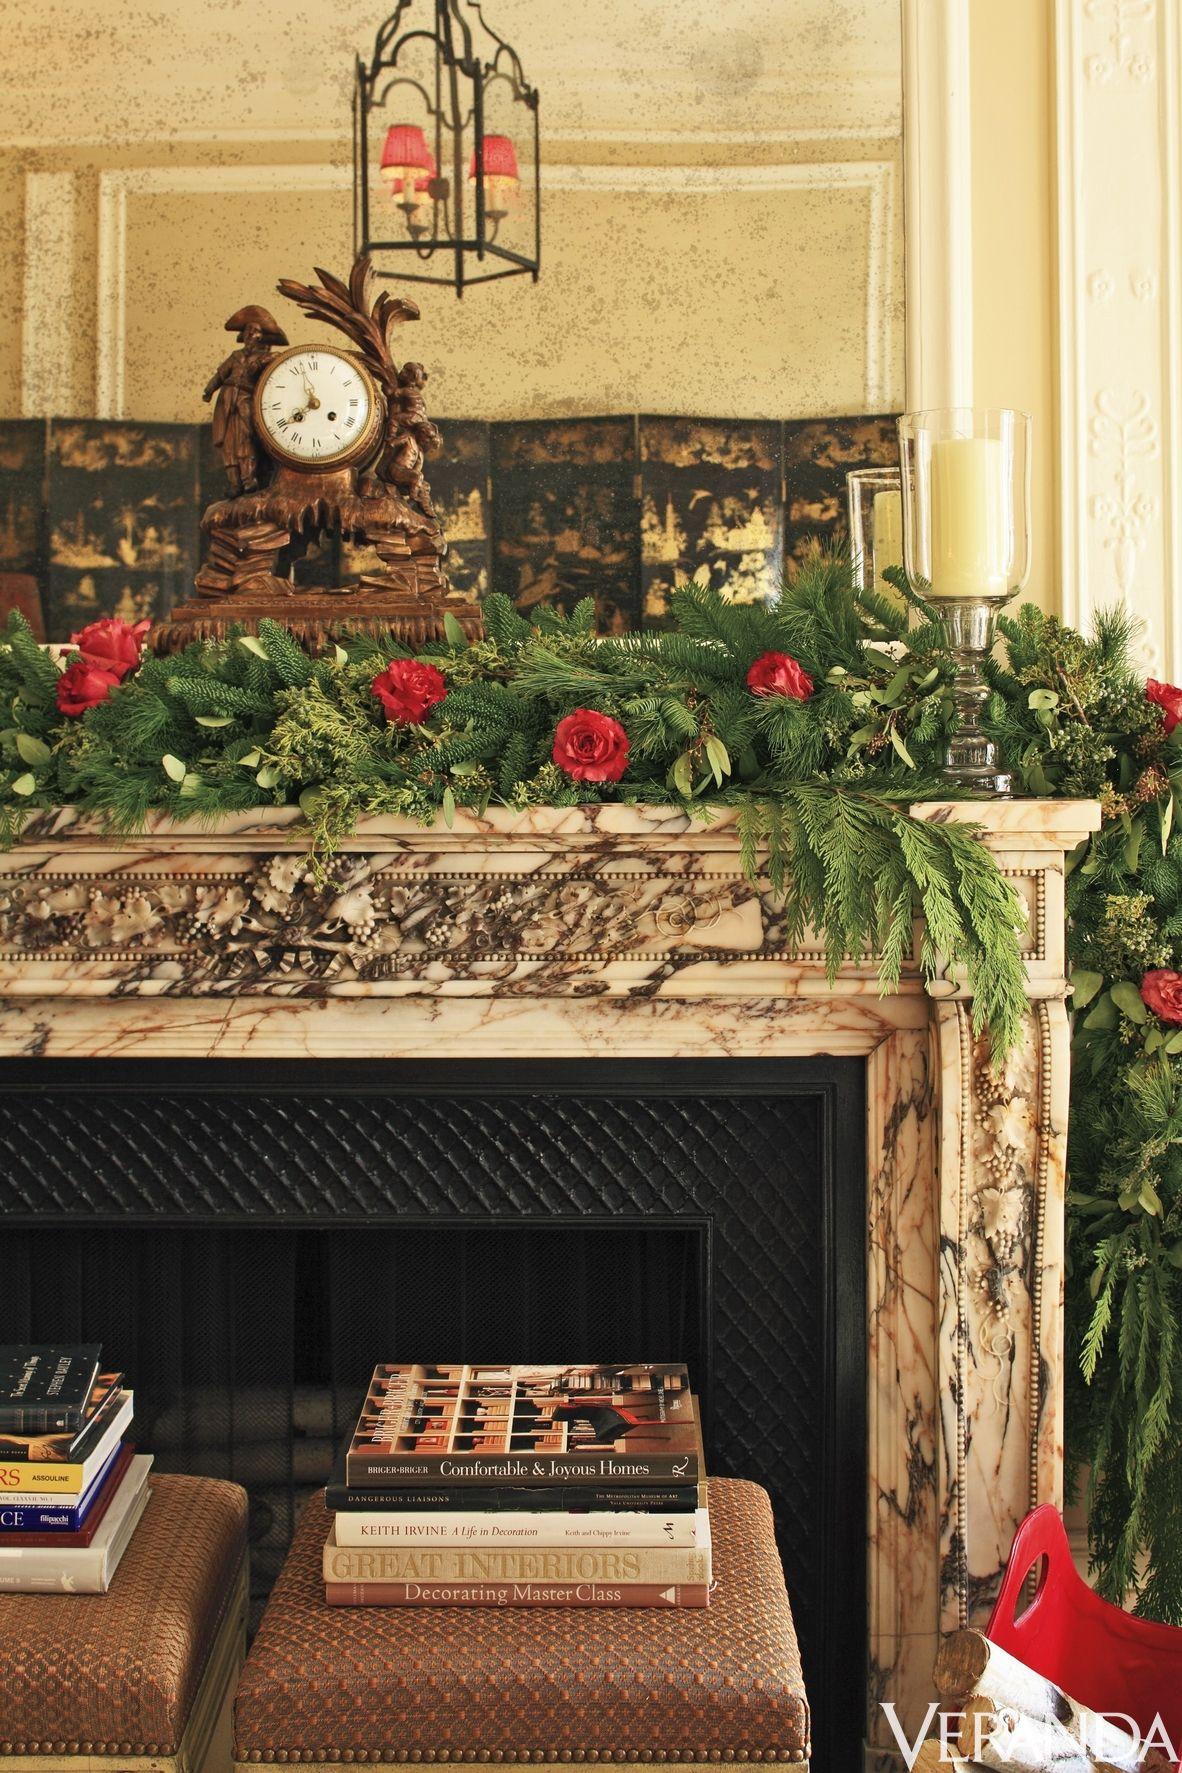 winter floral aranagements